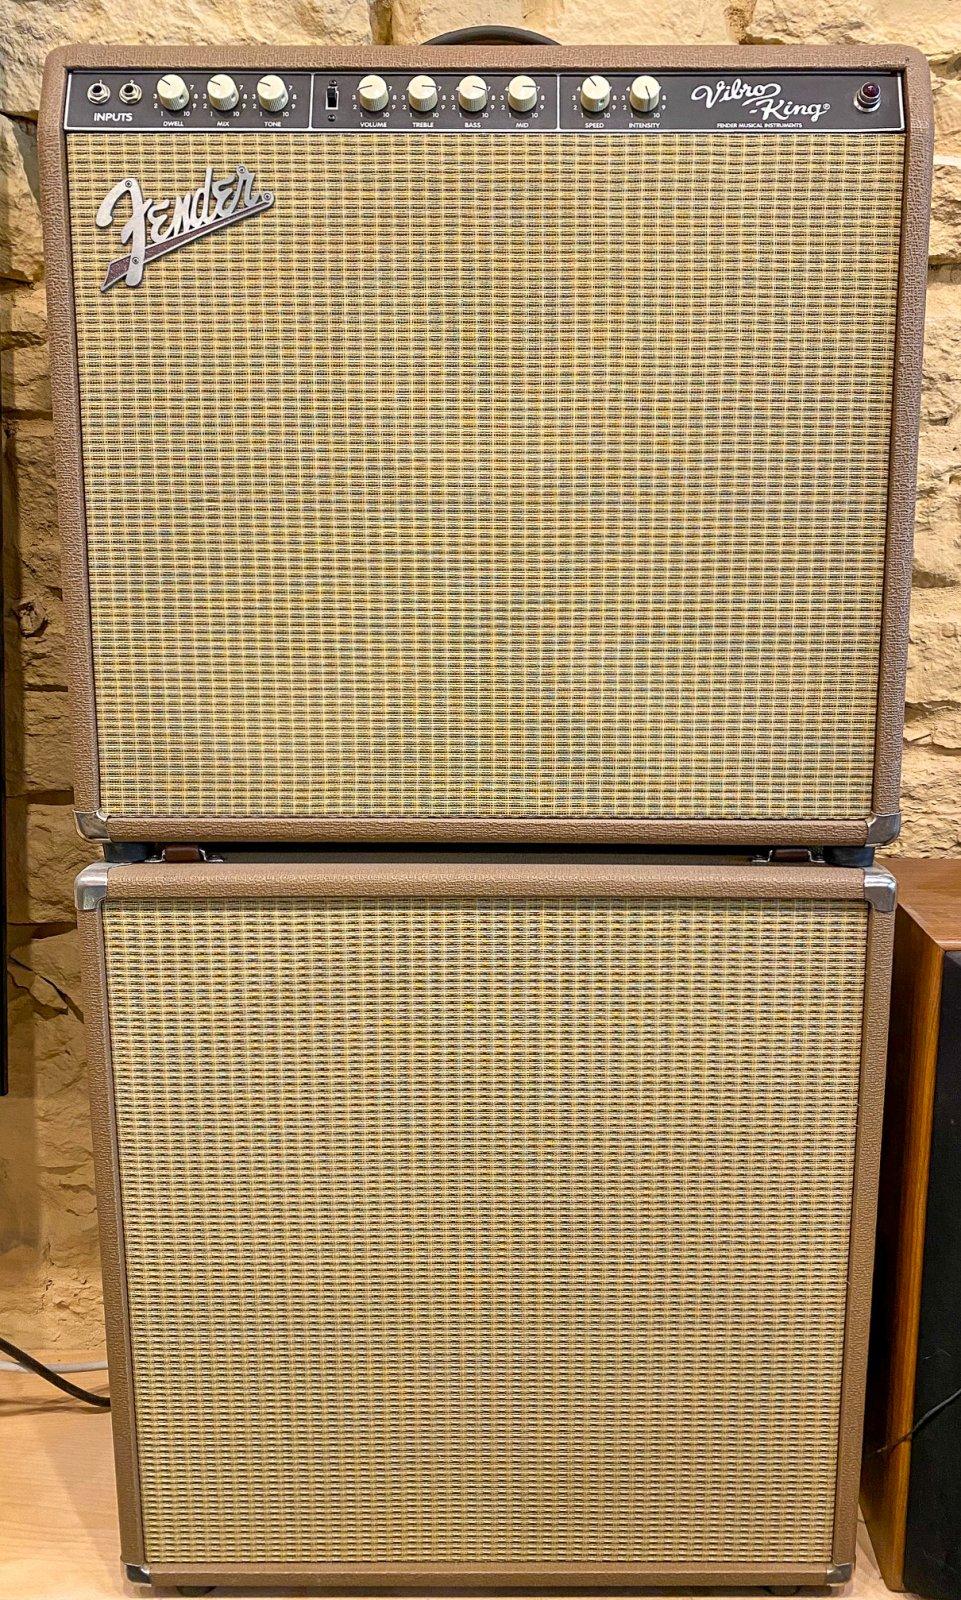 Fender Custom Shop Vibro-King 60w 3x10 Combo w/2x12 Cabinet